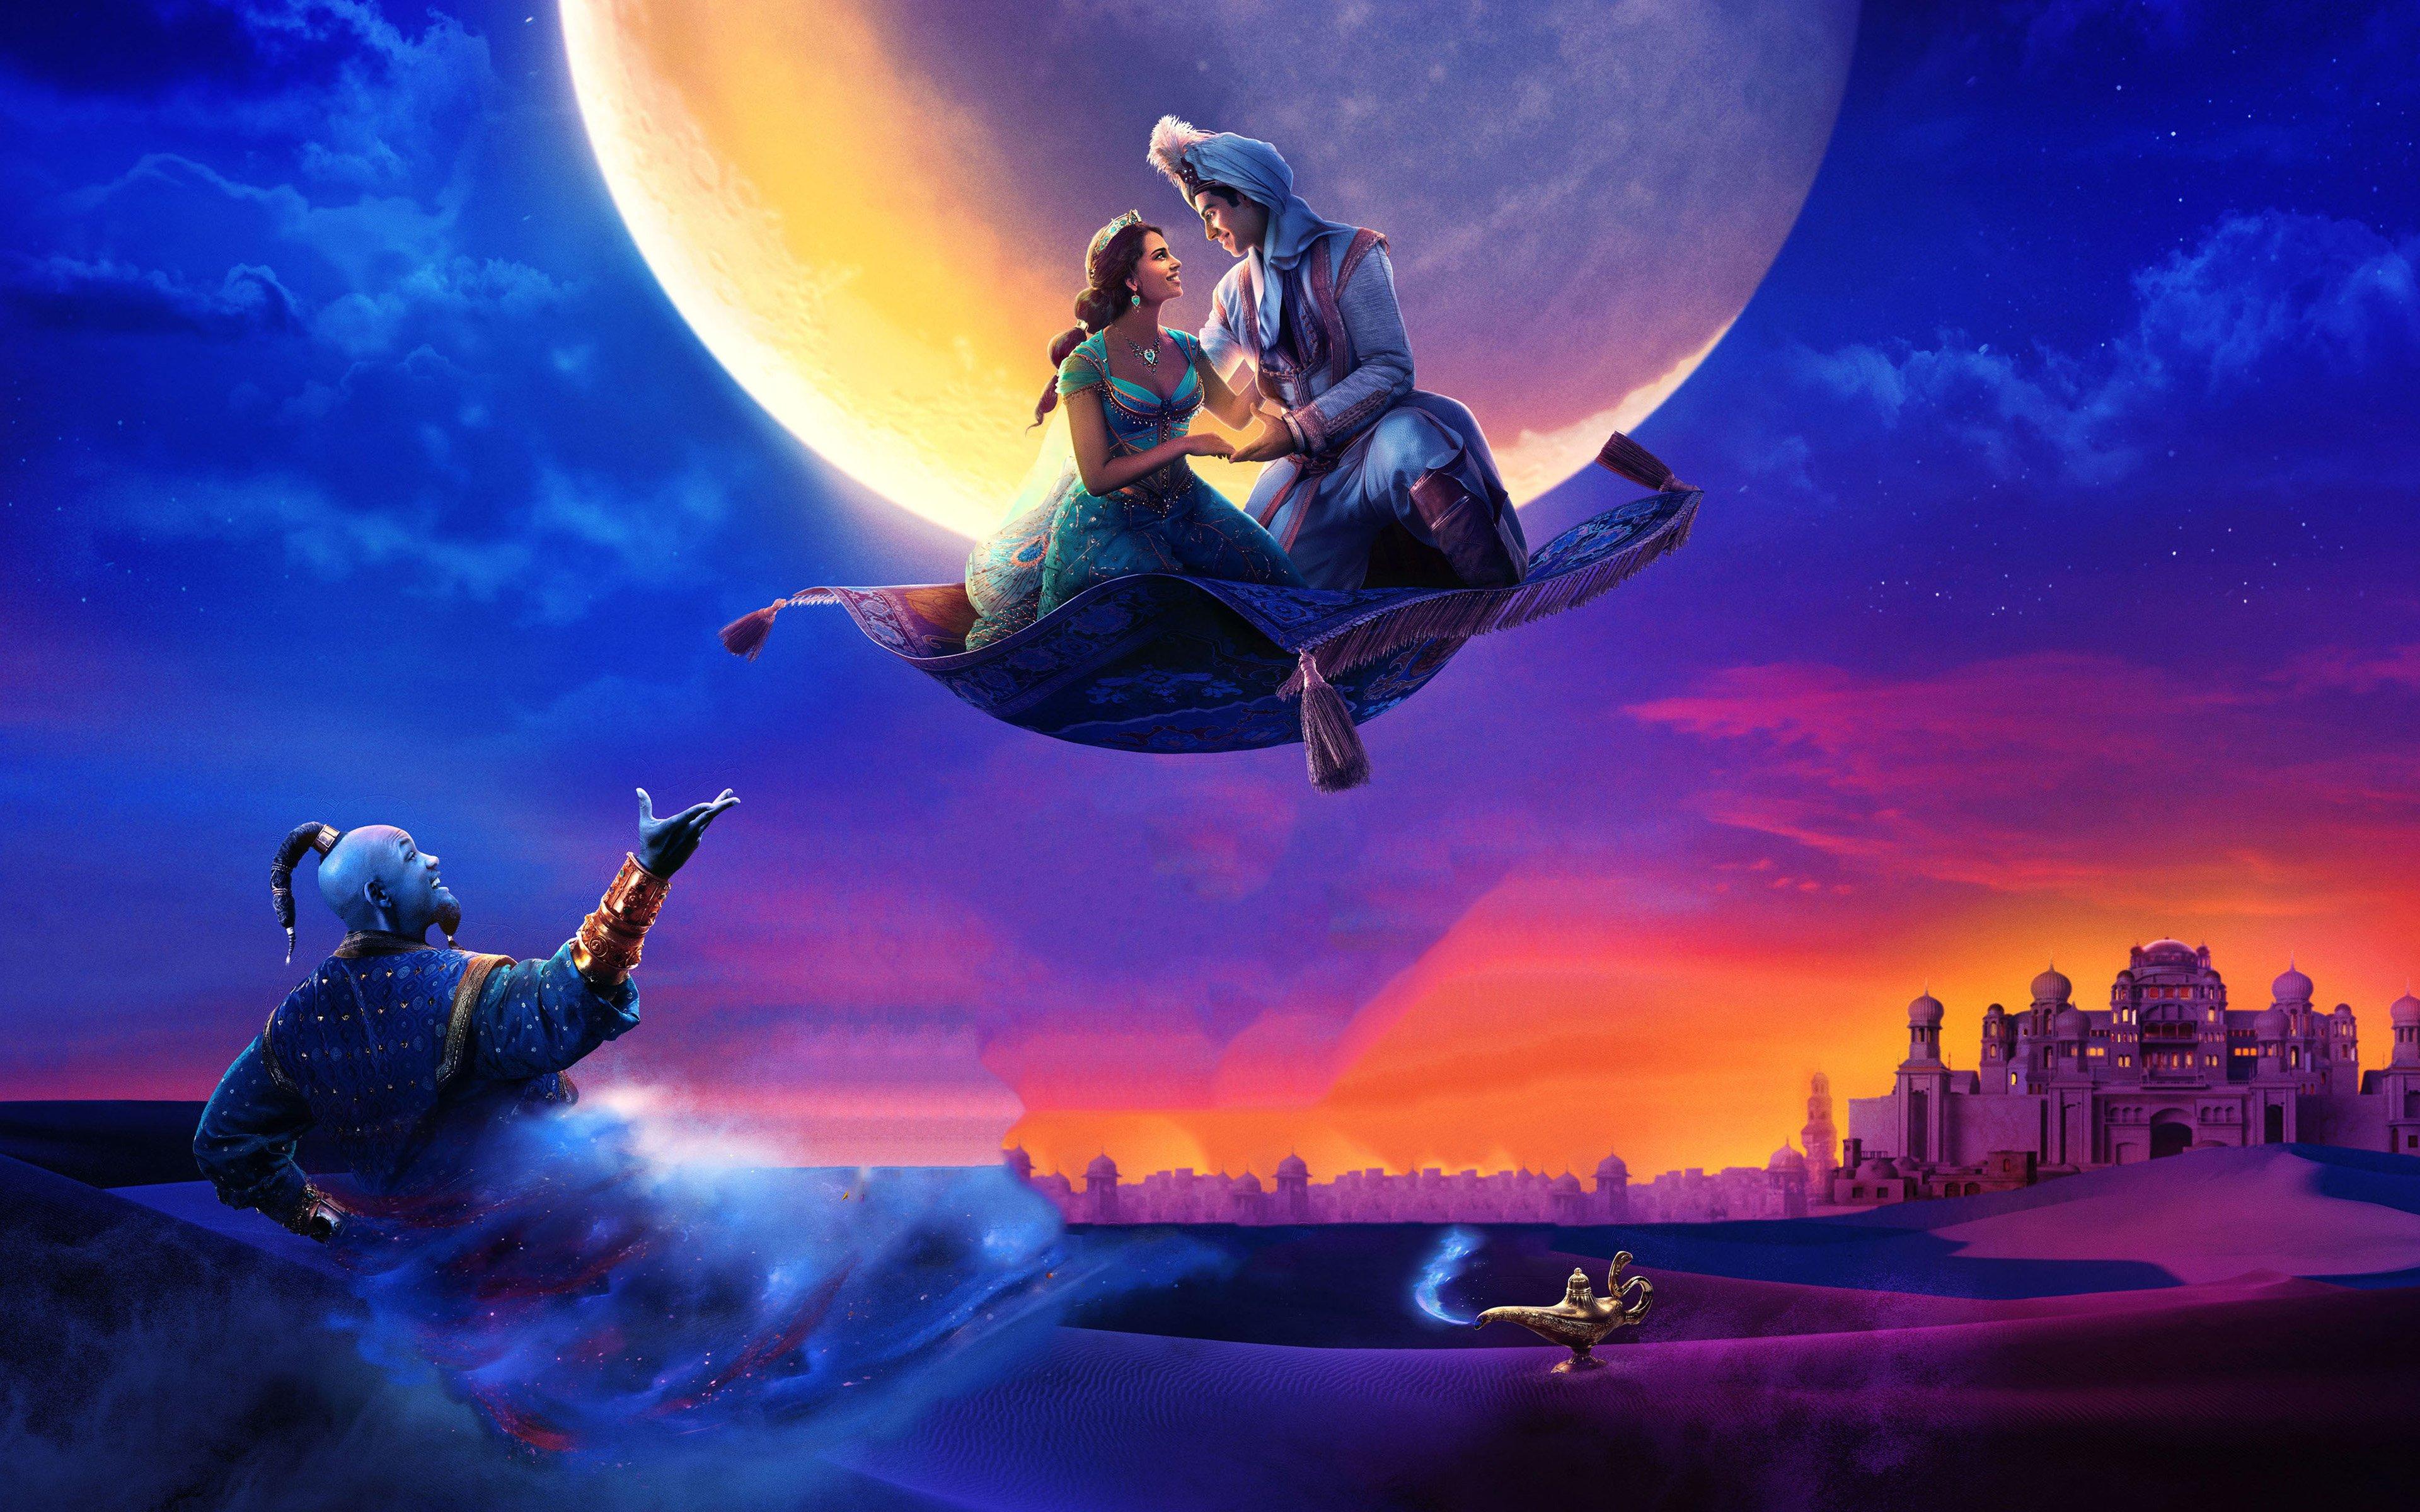 Fondos de pantalla Personajes de Aladin